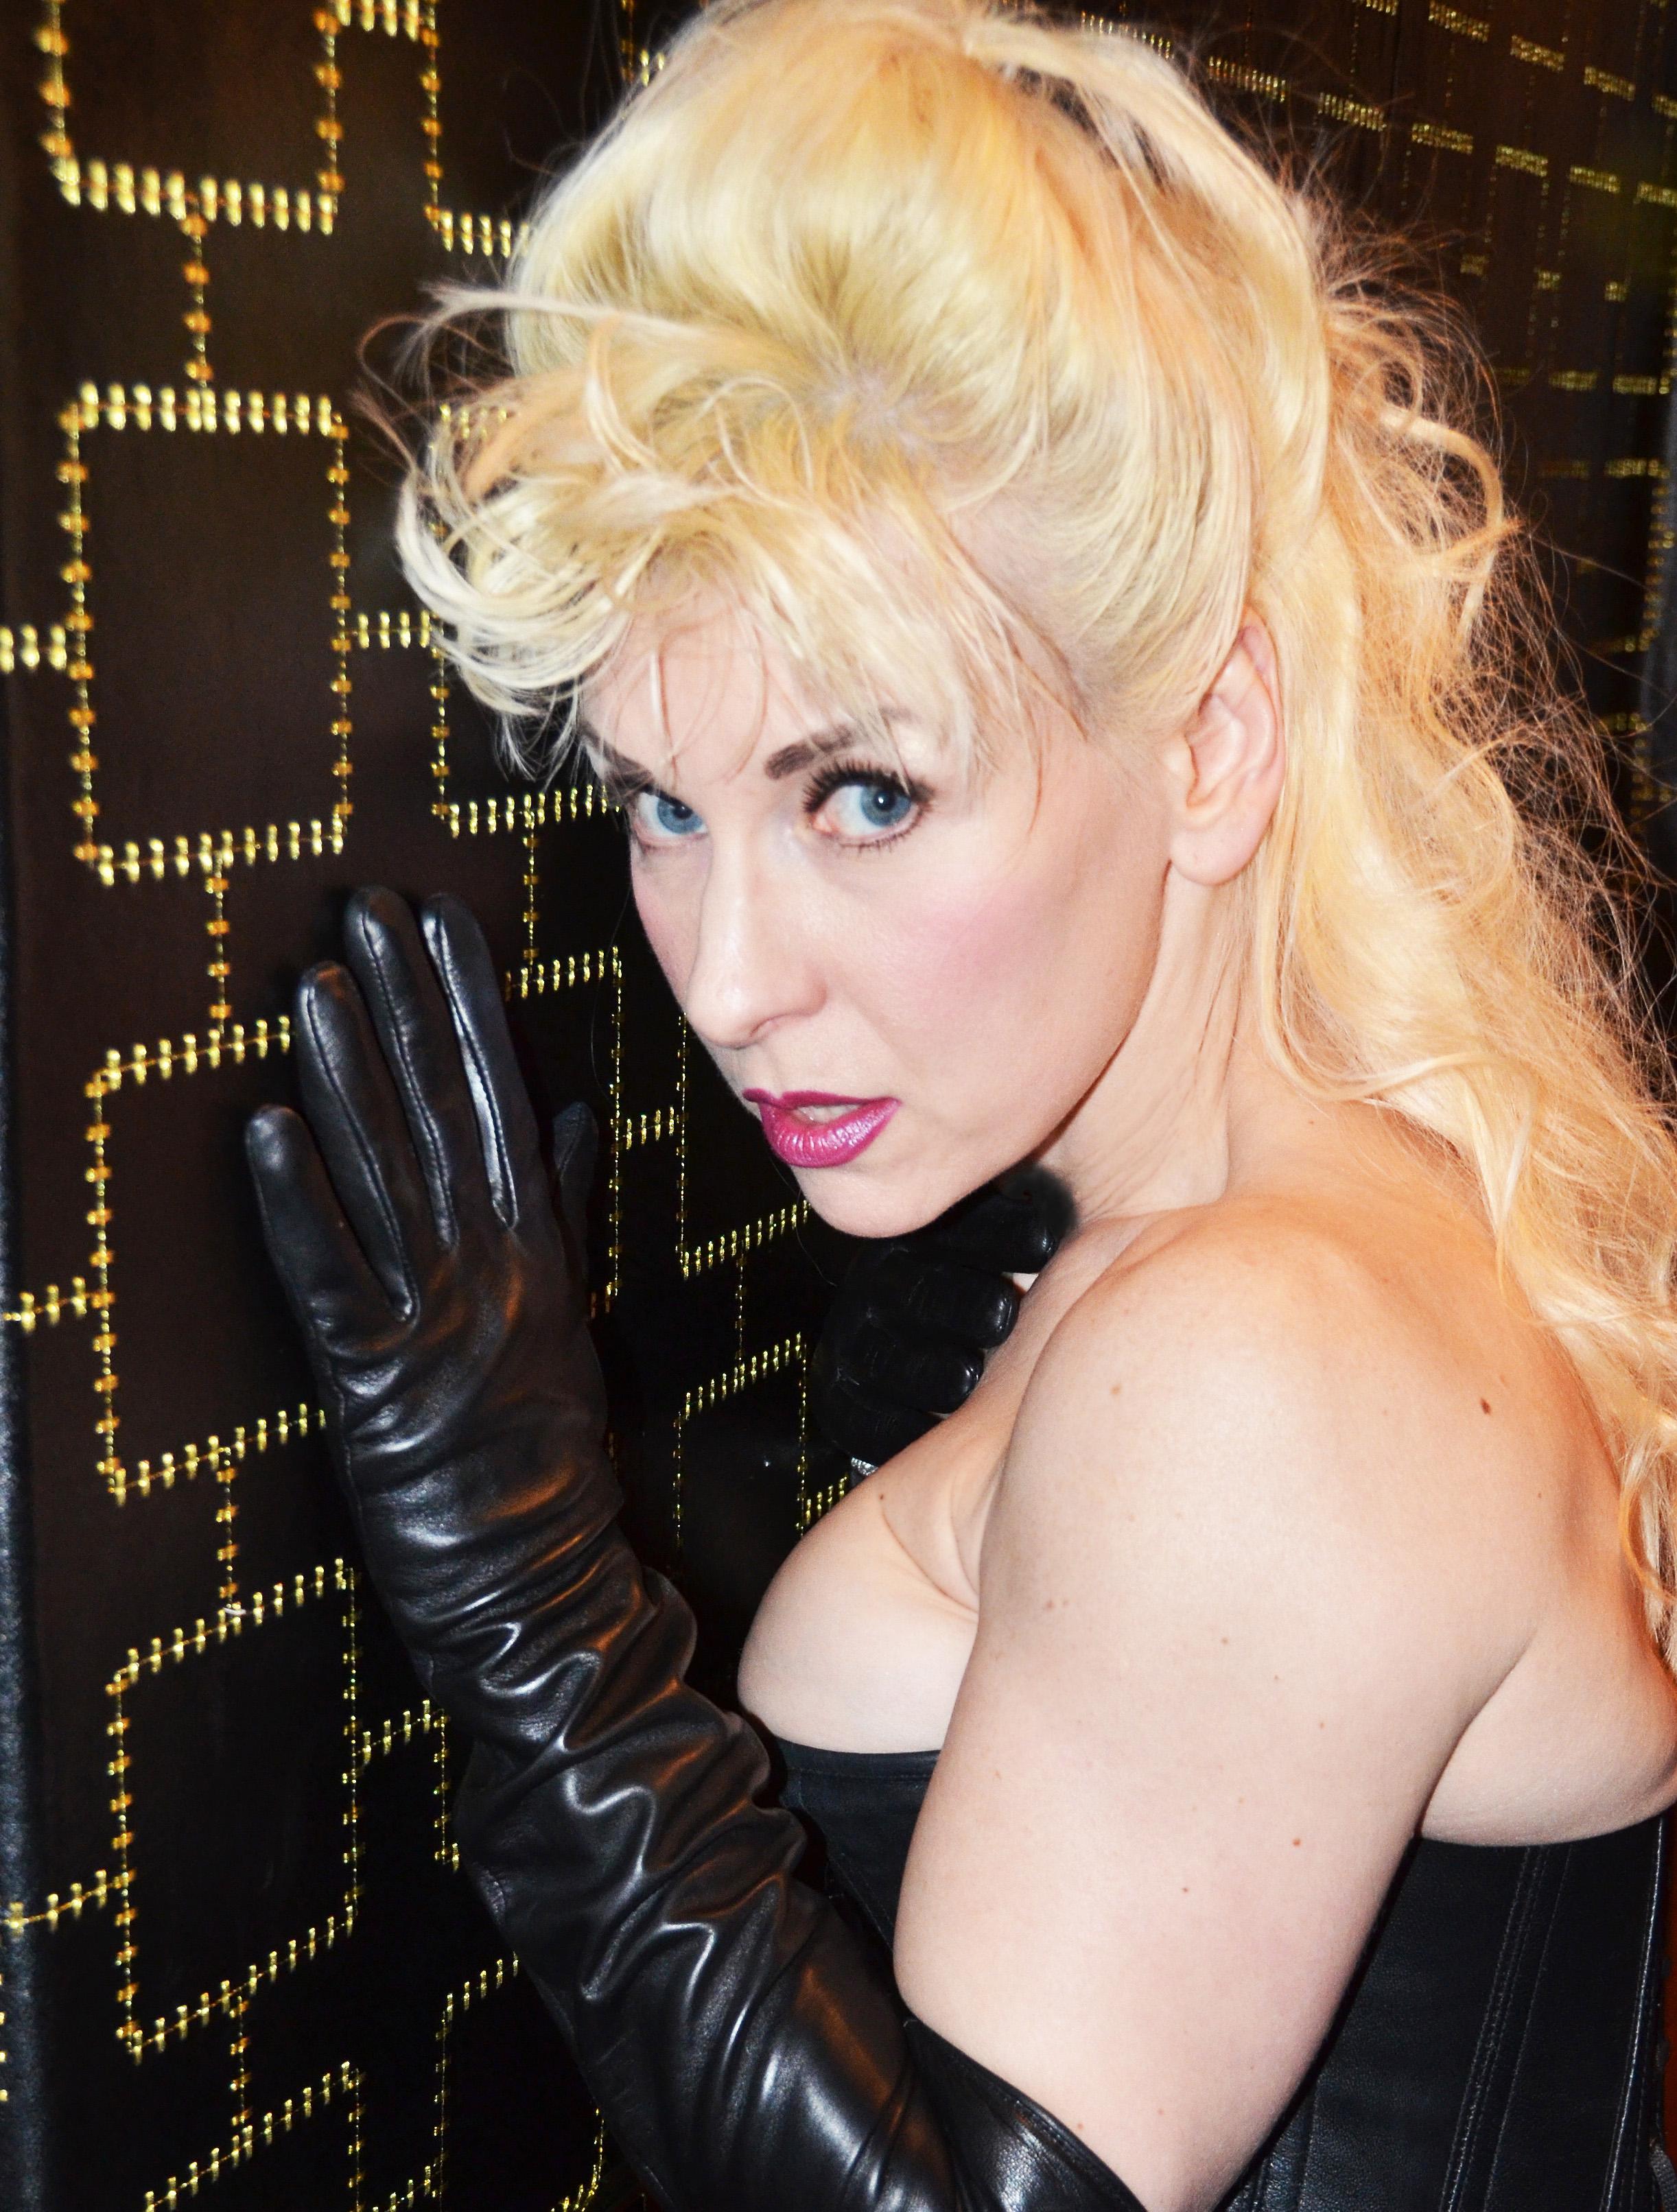 Madame c amp mistress esme tease angelica 8